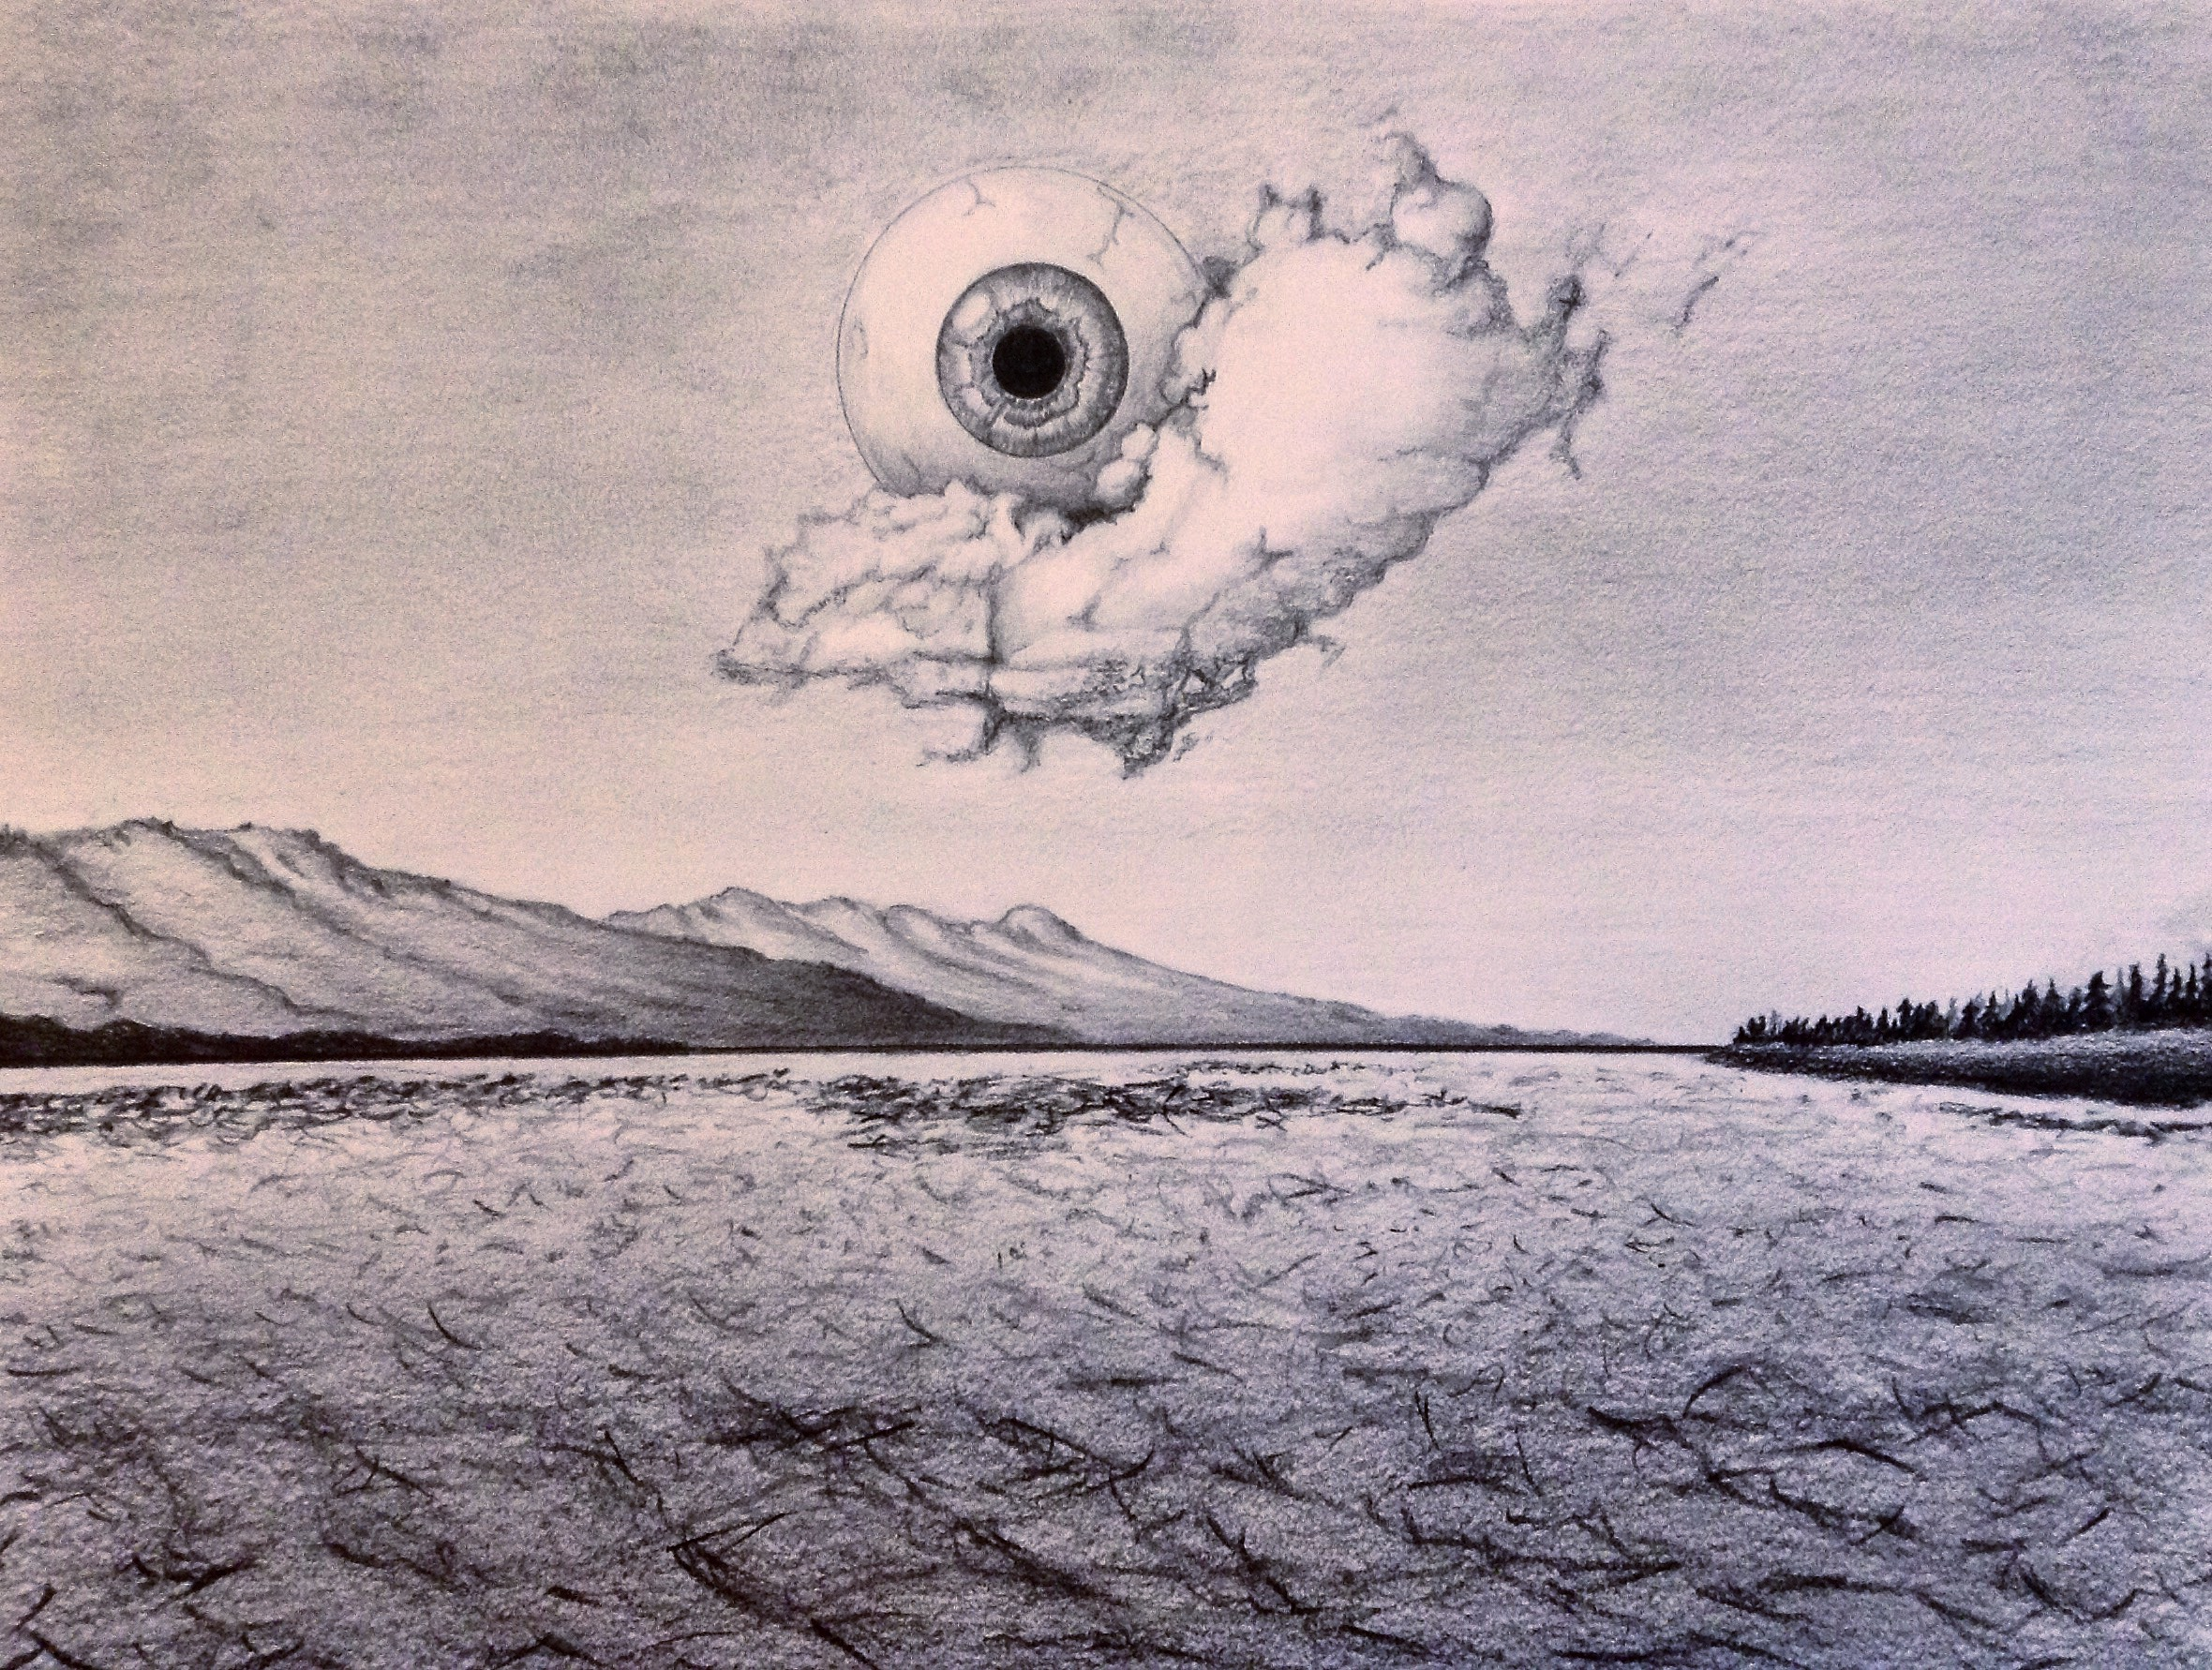 Landscape / pencil, 8.5x11in / $100